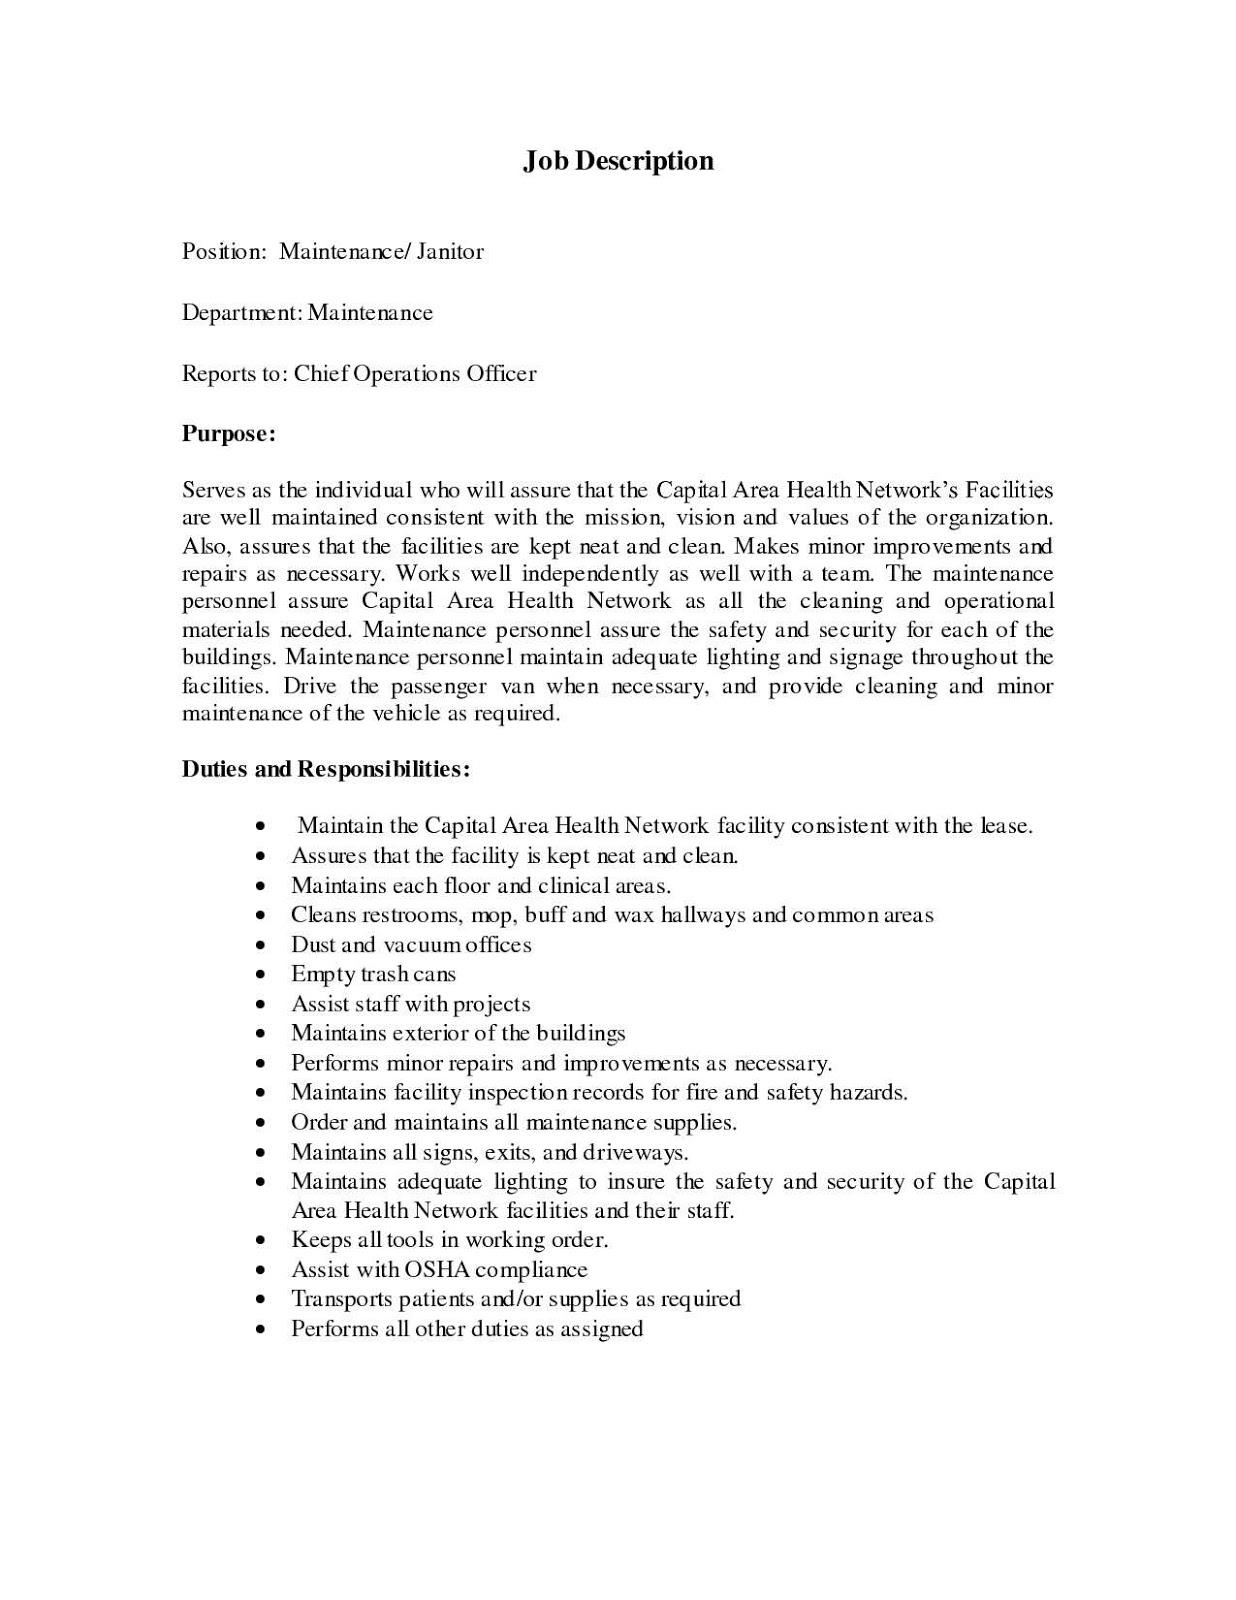 janitorial resume samples janitorial supervisor resume sample janitorial sample resume examples janitorial services resume sample janitorial objective resume samples janitorial manager resume sample